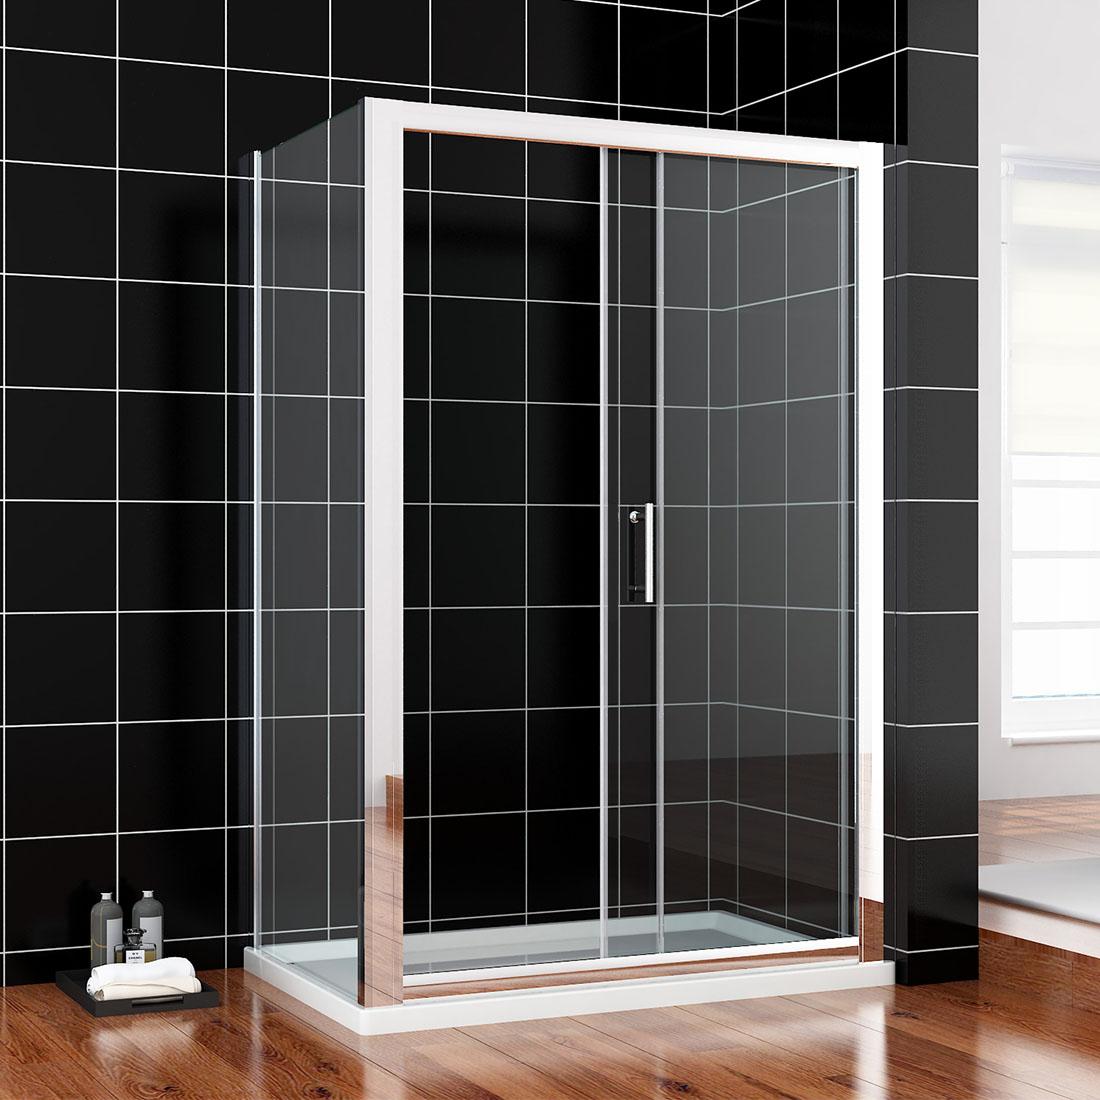 Details About Framed Sliding Door Bottom Seal Bath Shower Screen 150x76cm